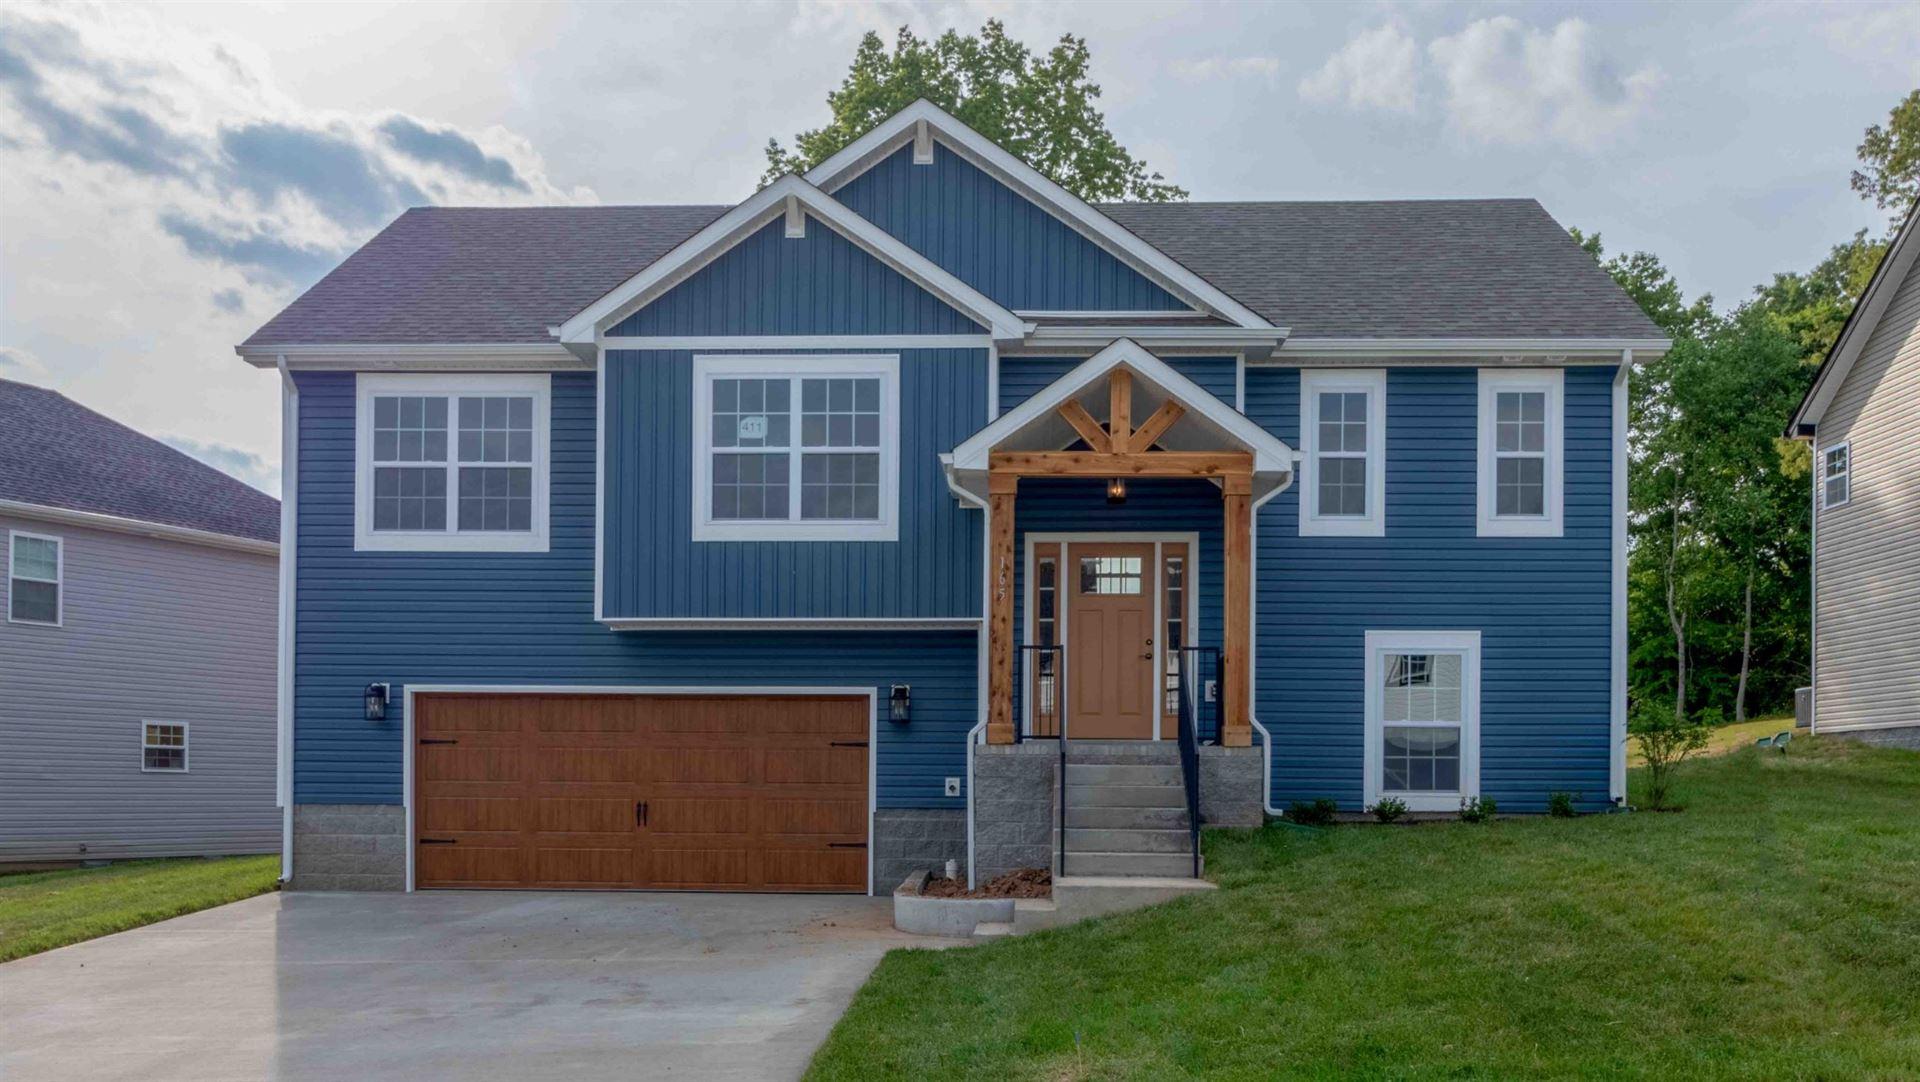 165 Bonnell Drive, Clarksville, TN 37042 - MLS#: 2206799